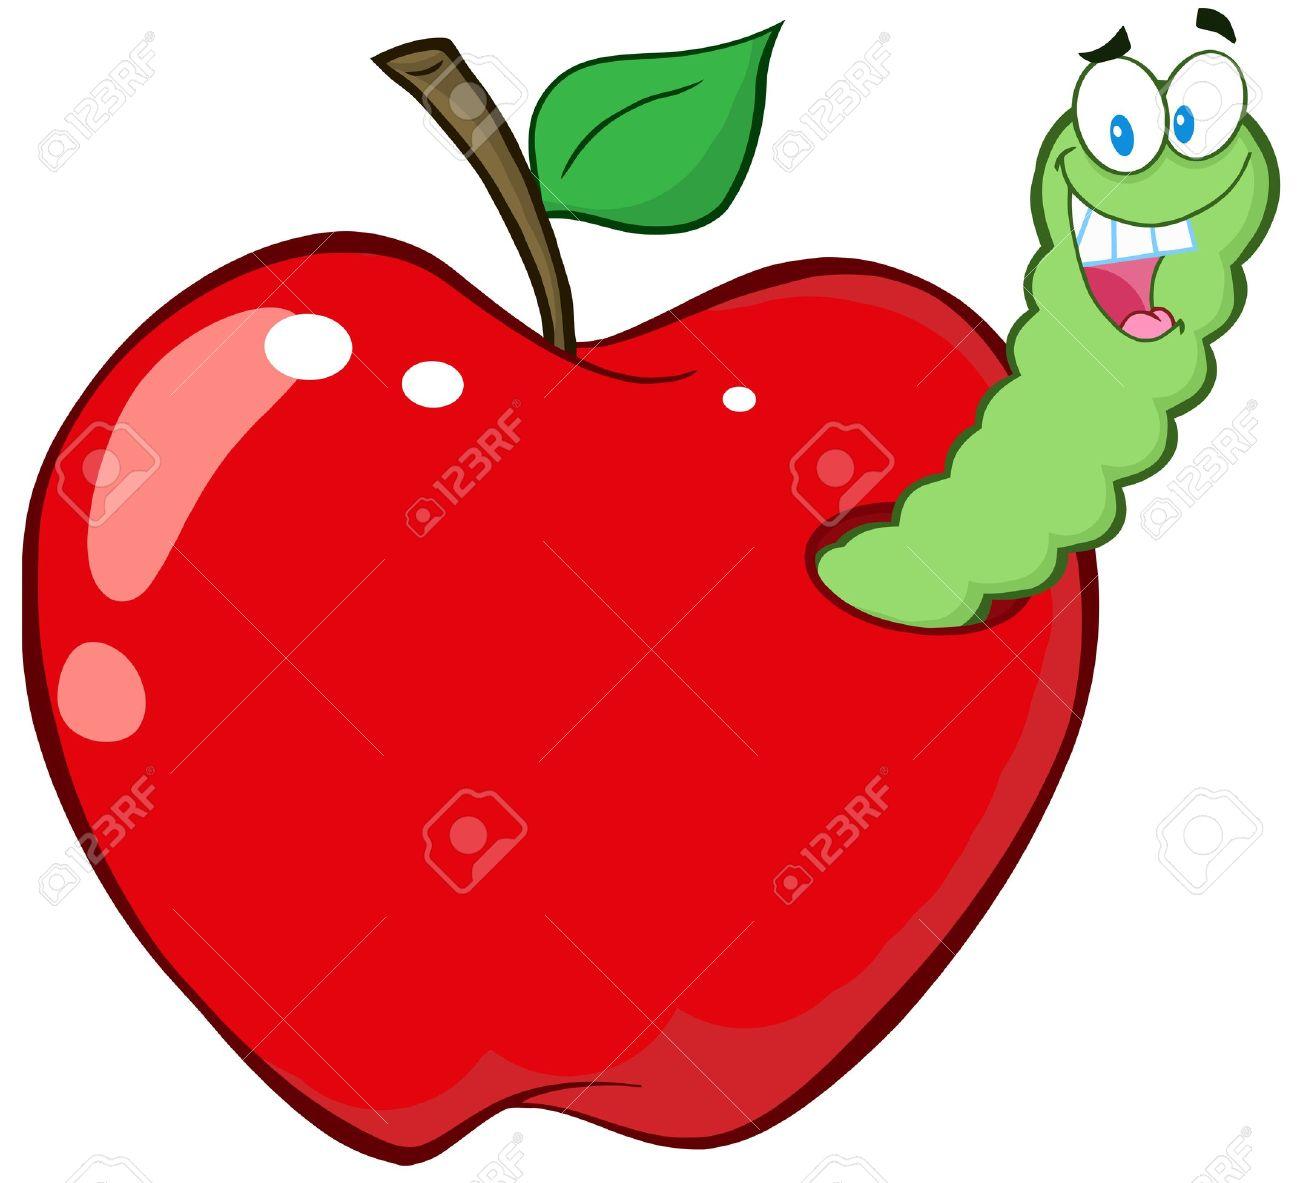 Apple Worm Clipart